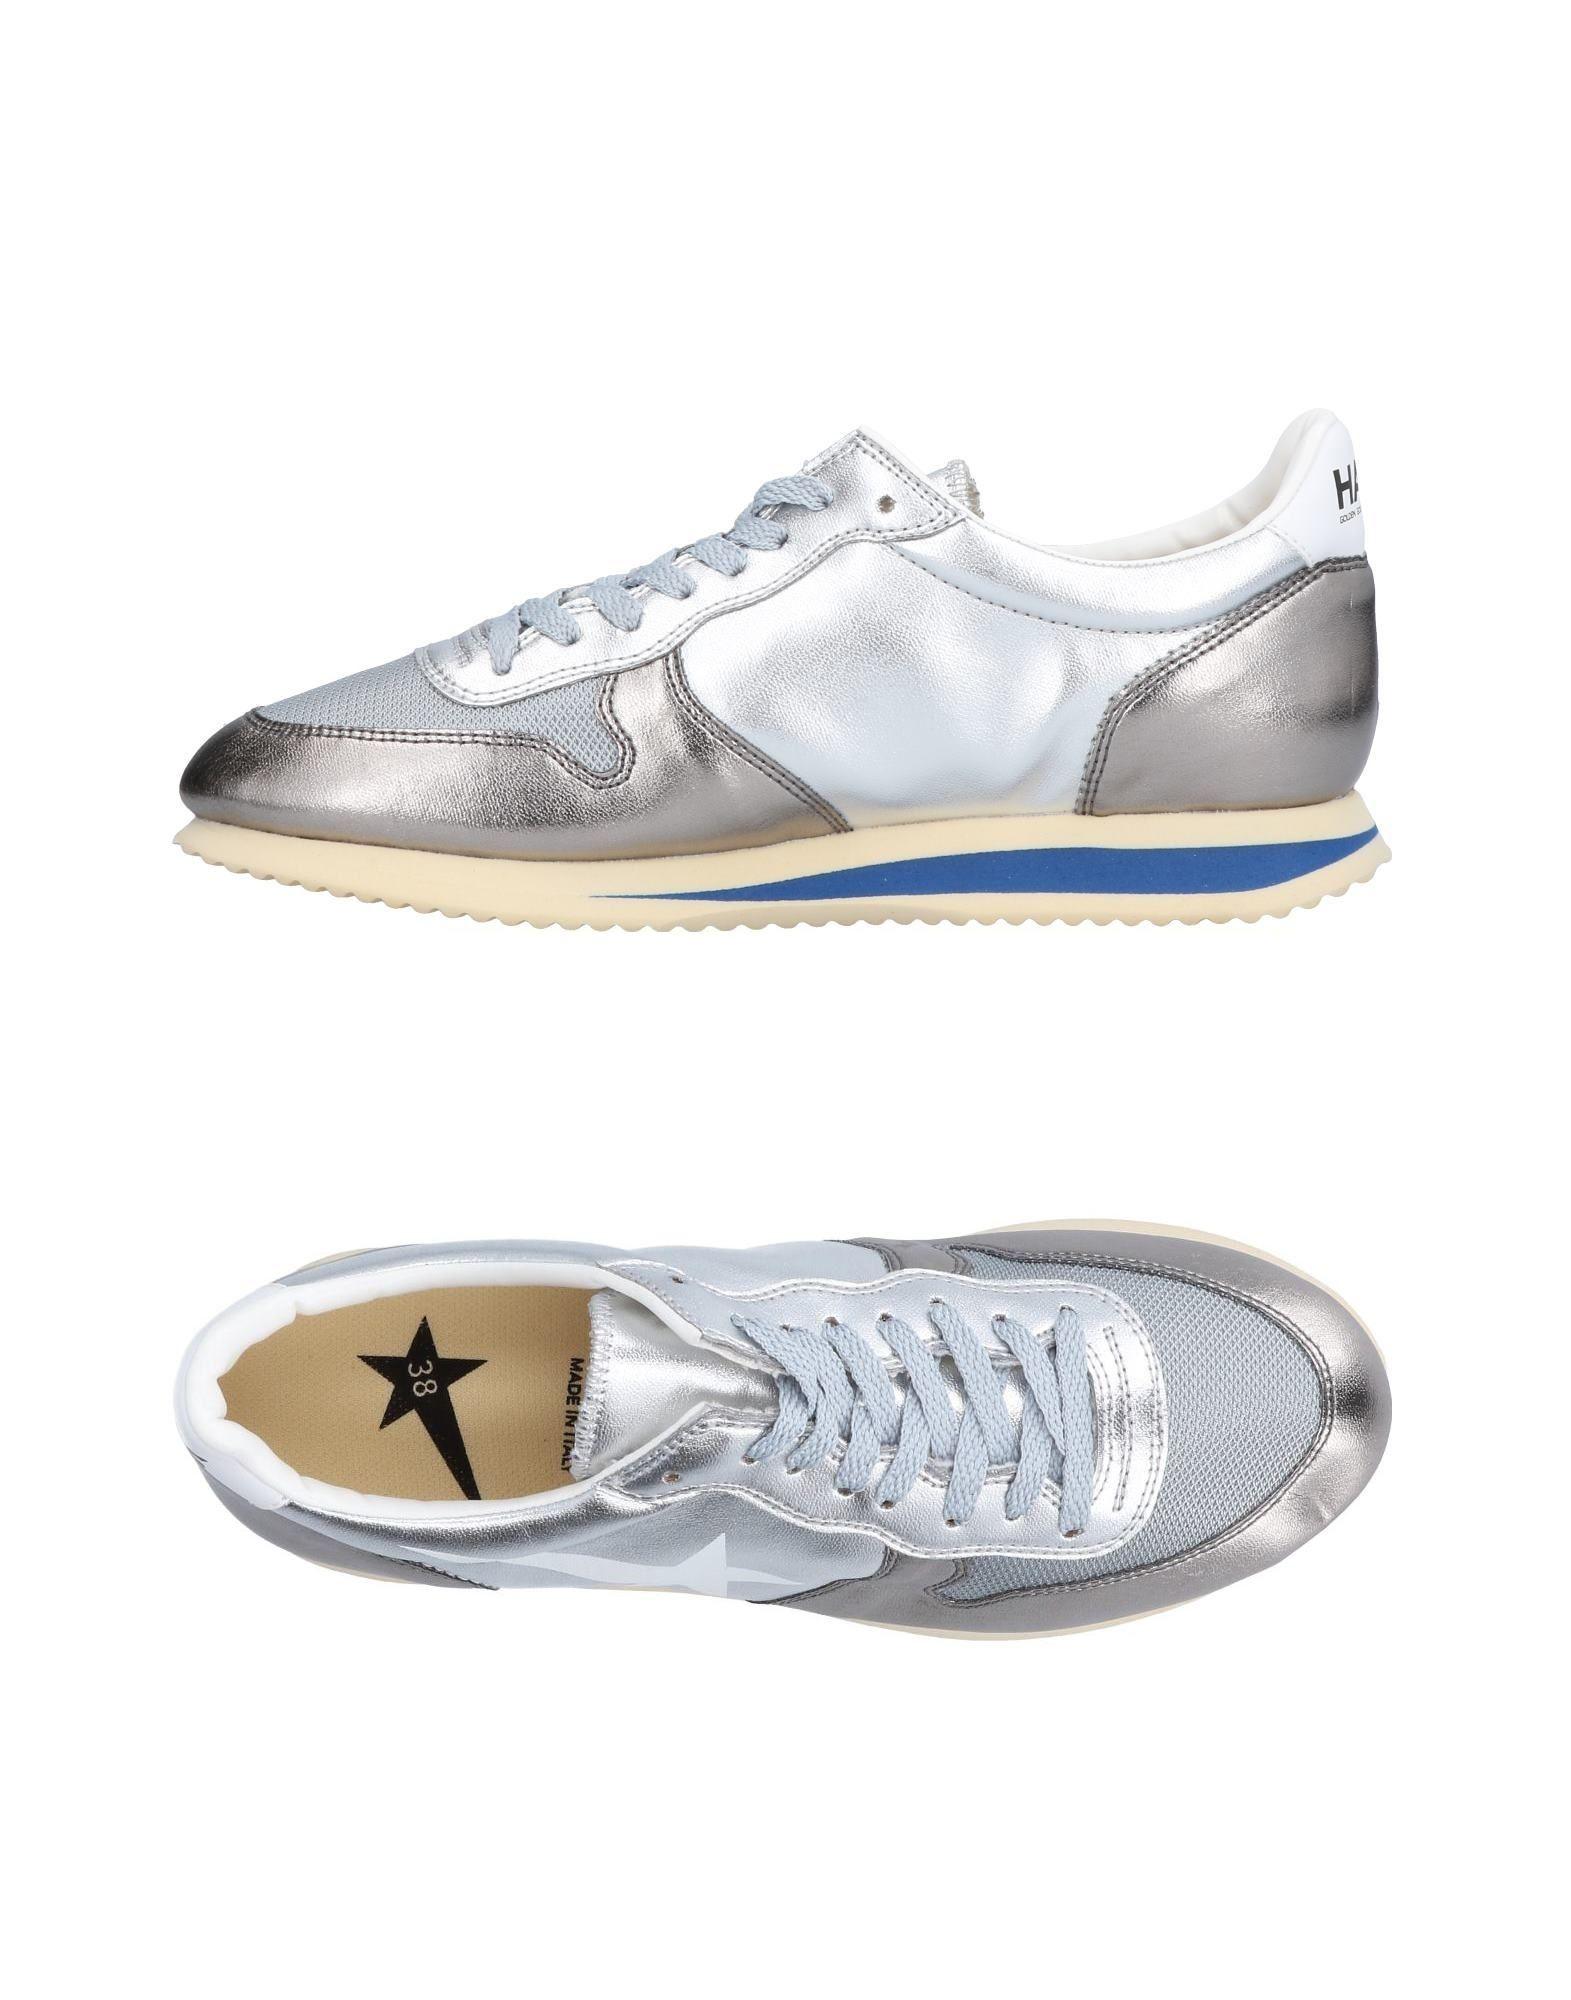 Haus Golden Goose Sneakers Damen  11470214IX Gute Qualität beliebte Schuhe